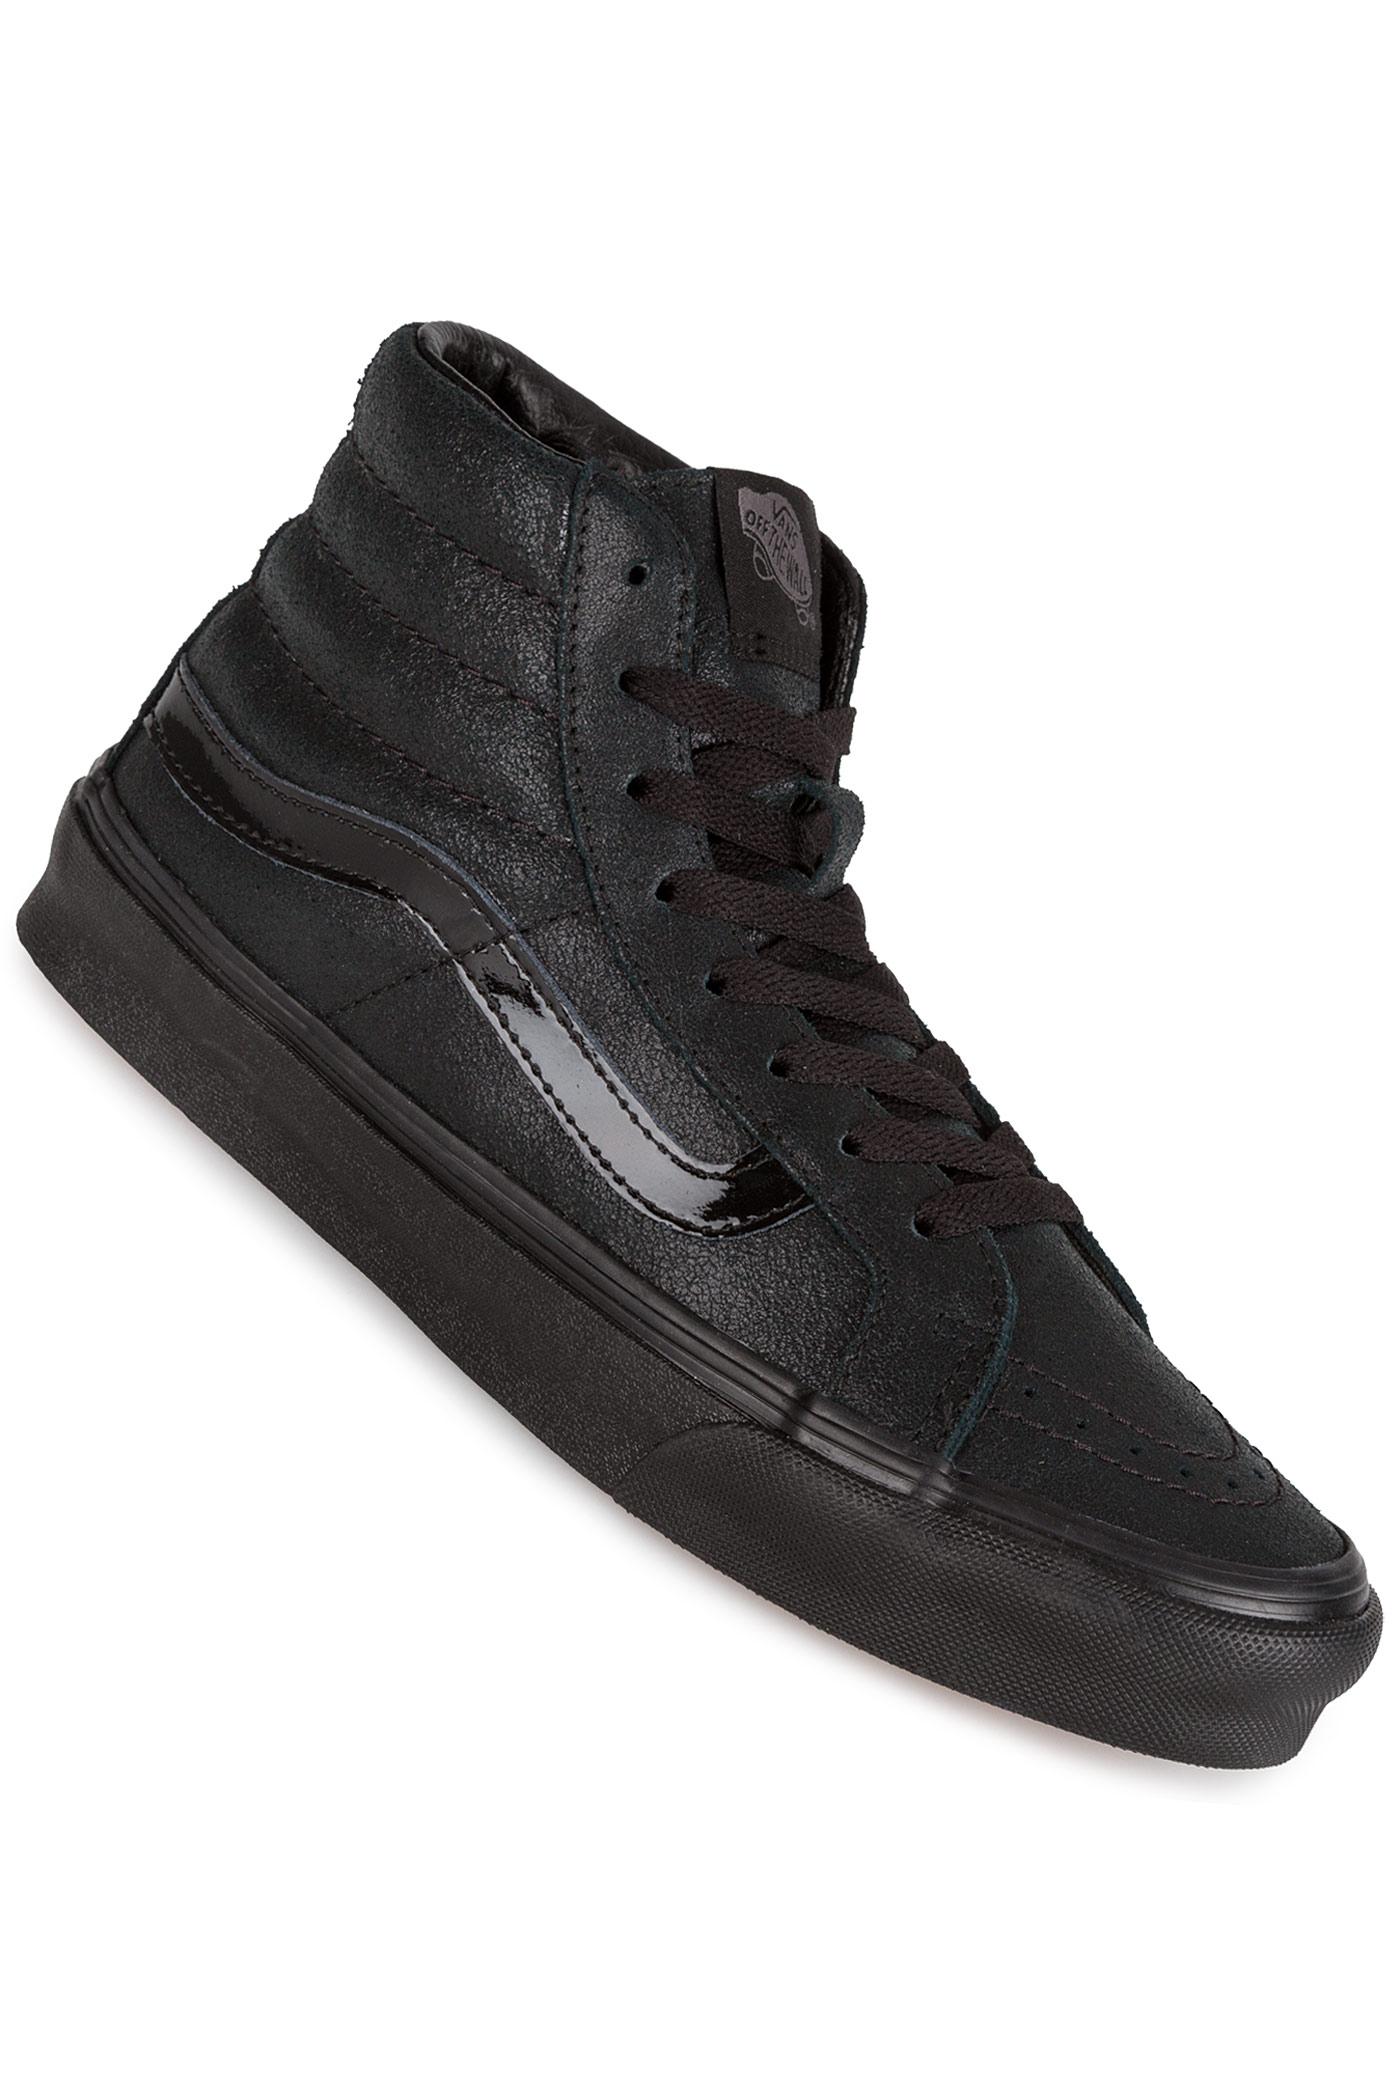 18a414eff46 Vans SK8-Hi Slim Shoe women (patent crackle black black) buy at ...